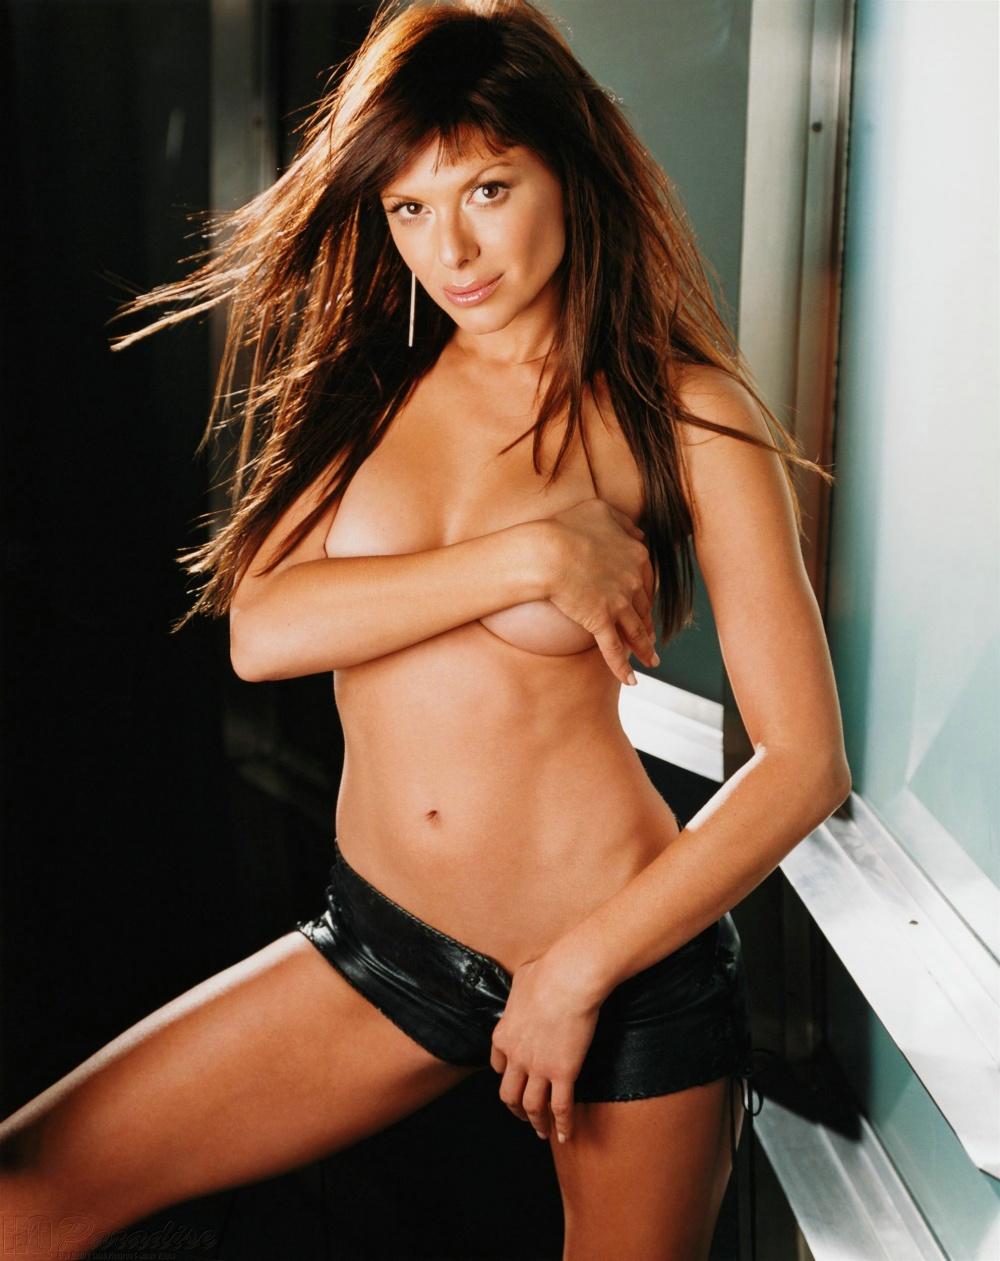 Kari Wuhrer Tits